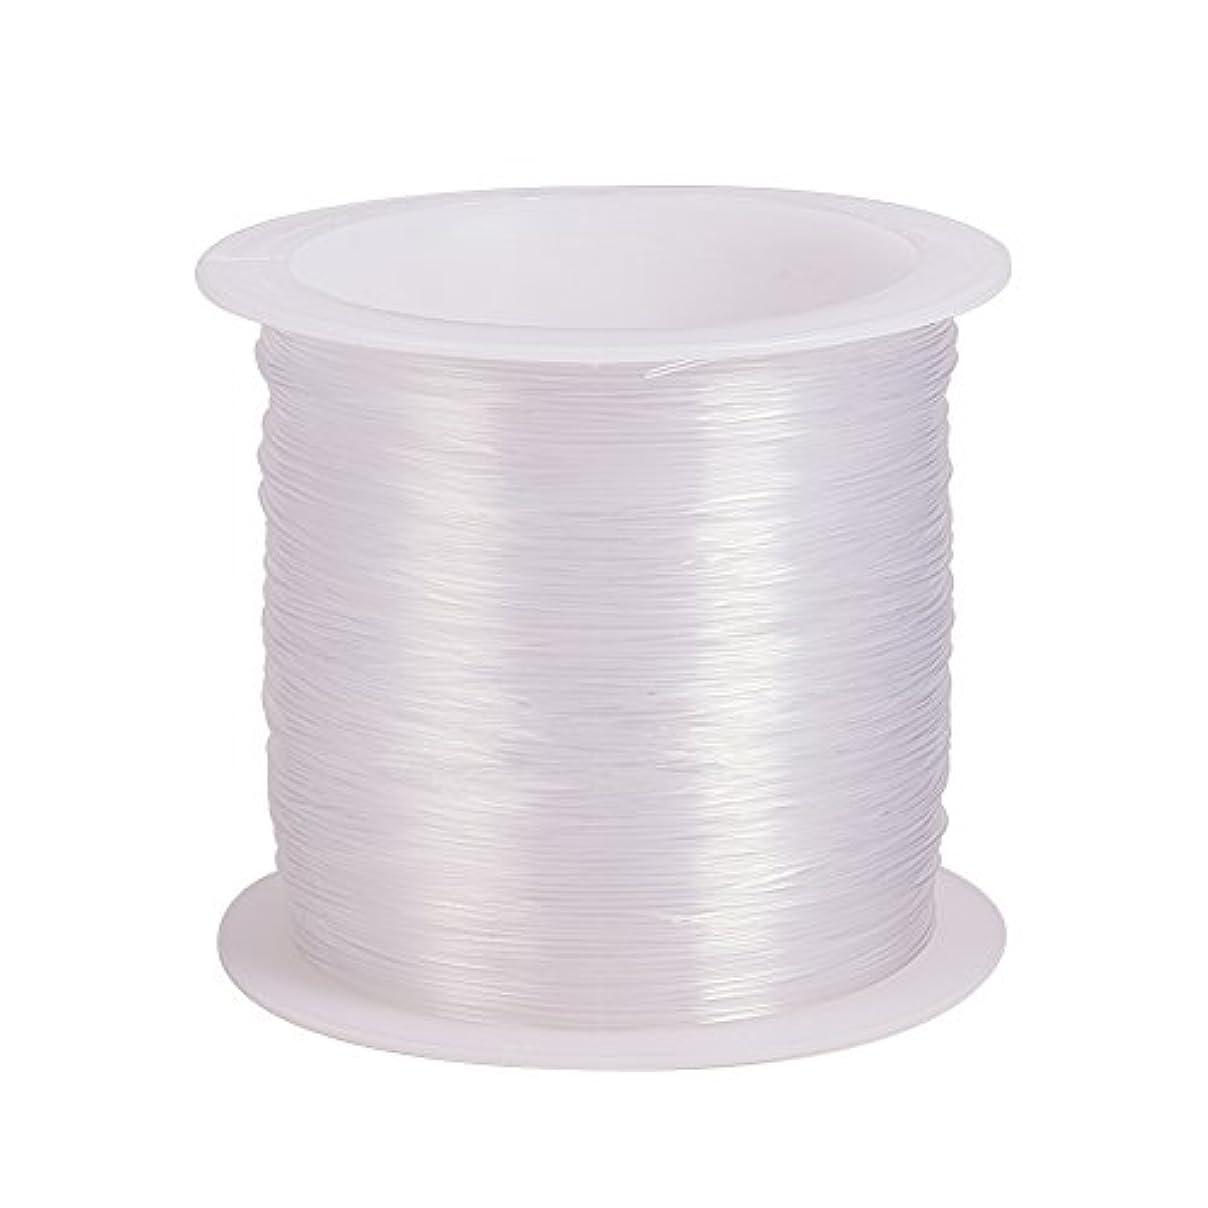 Pandahall 1 Roll 30m 0.45mm Crystal Nylon Thread Fishing Line Wire for Craft Bracelet Beads jv62492822897